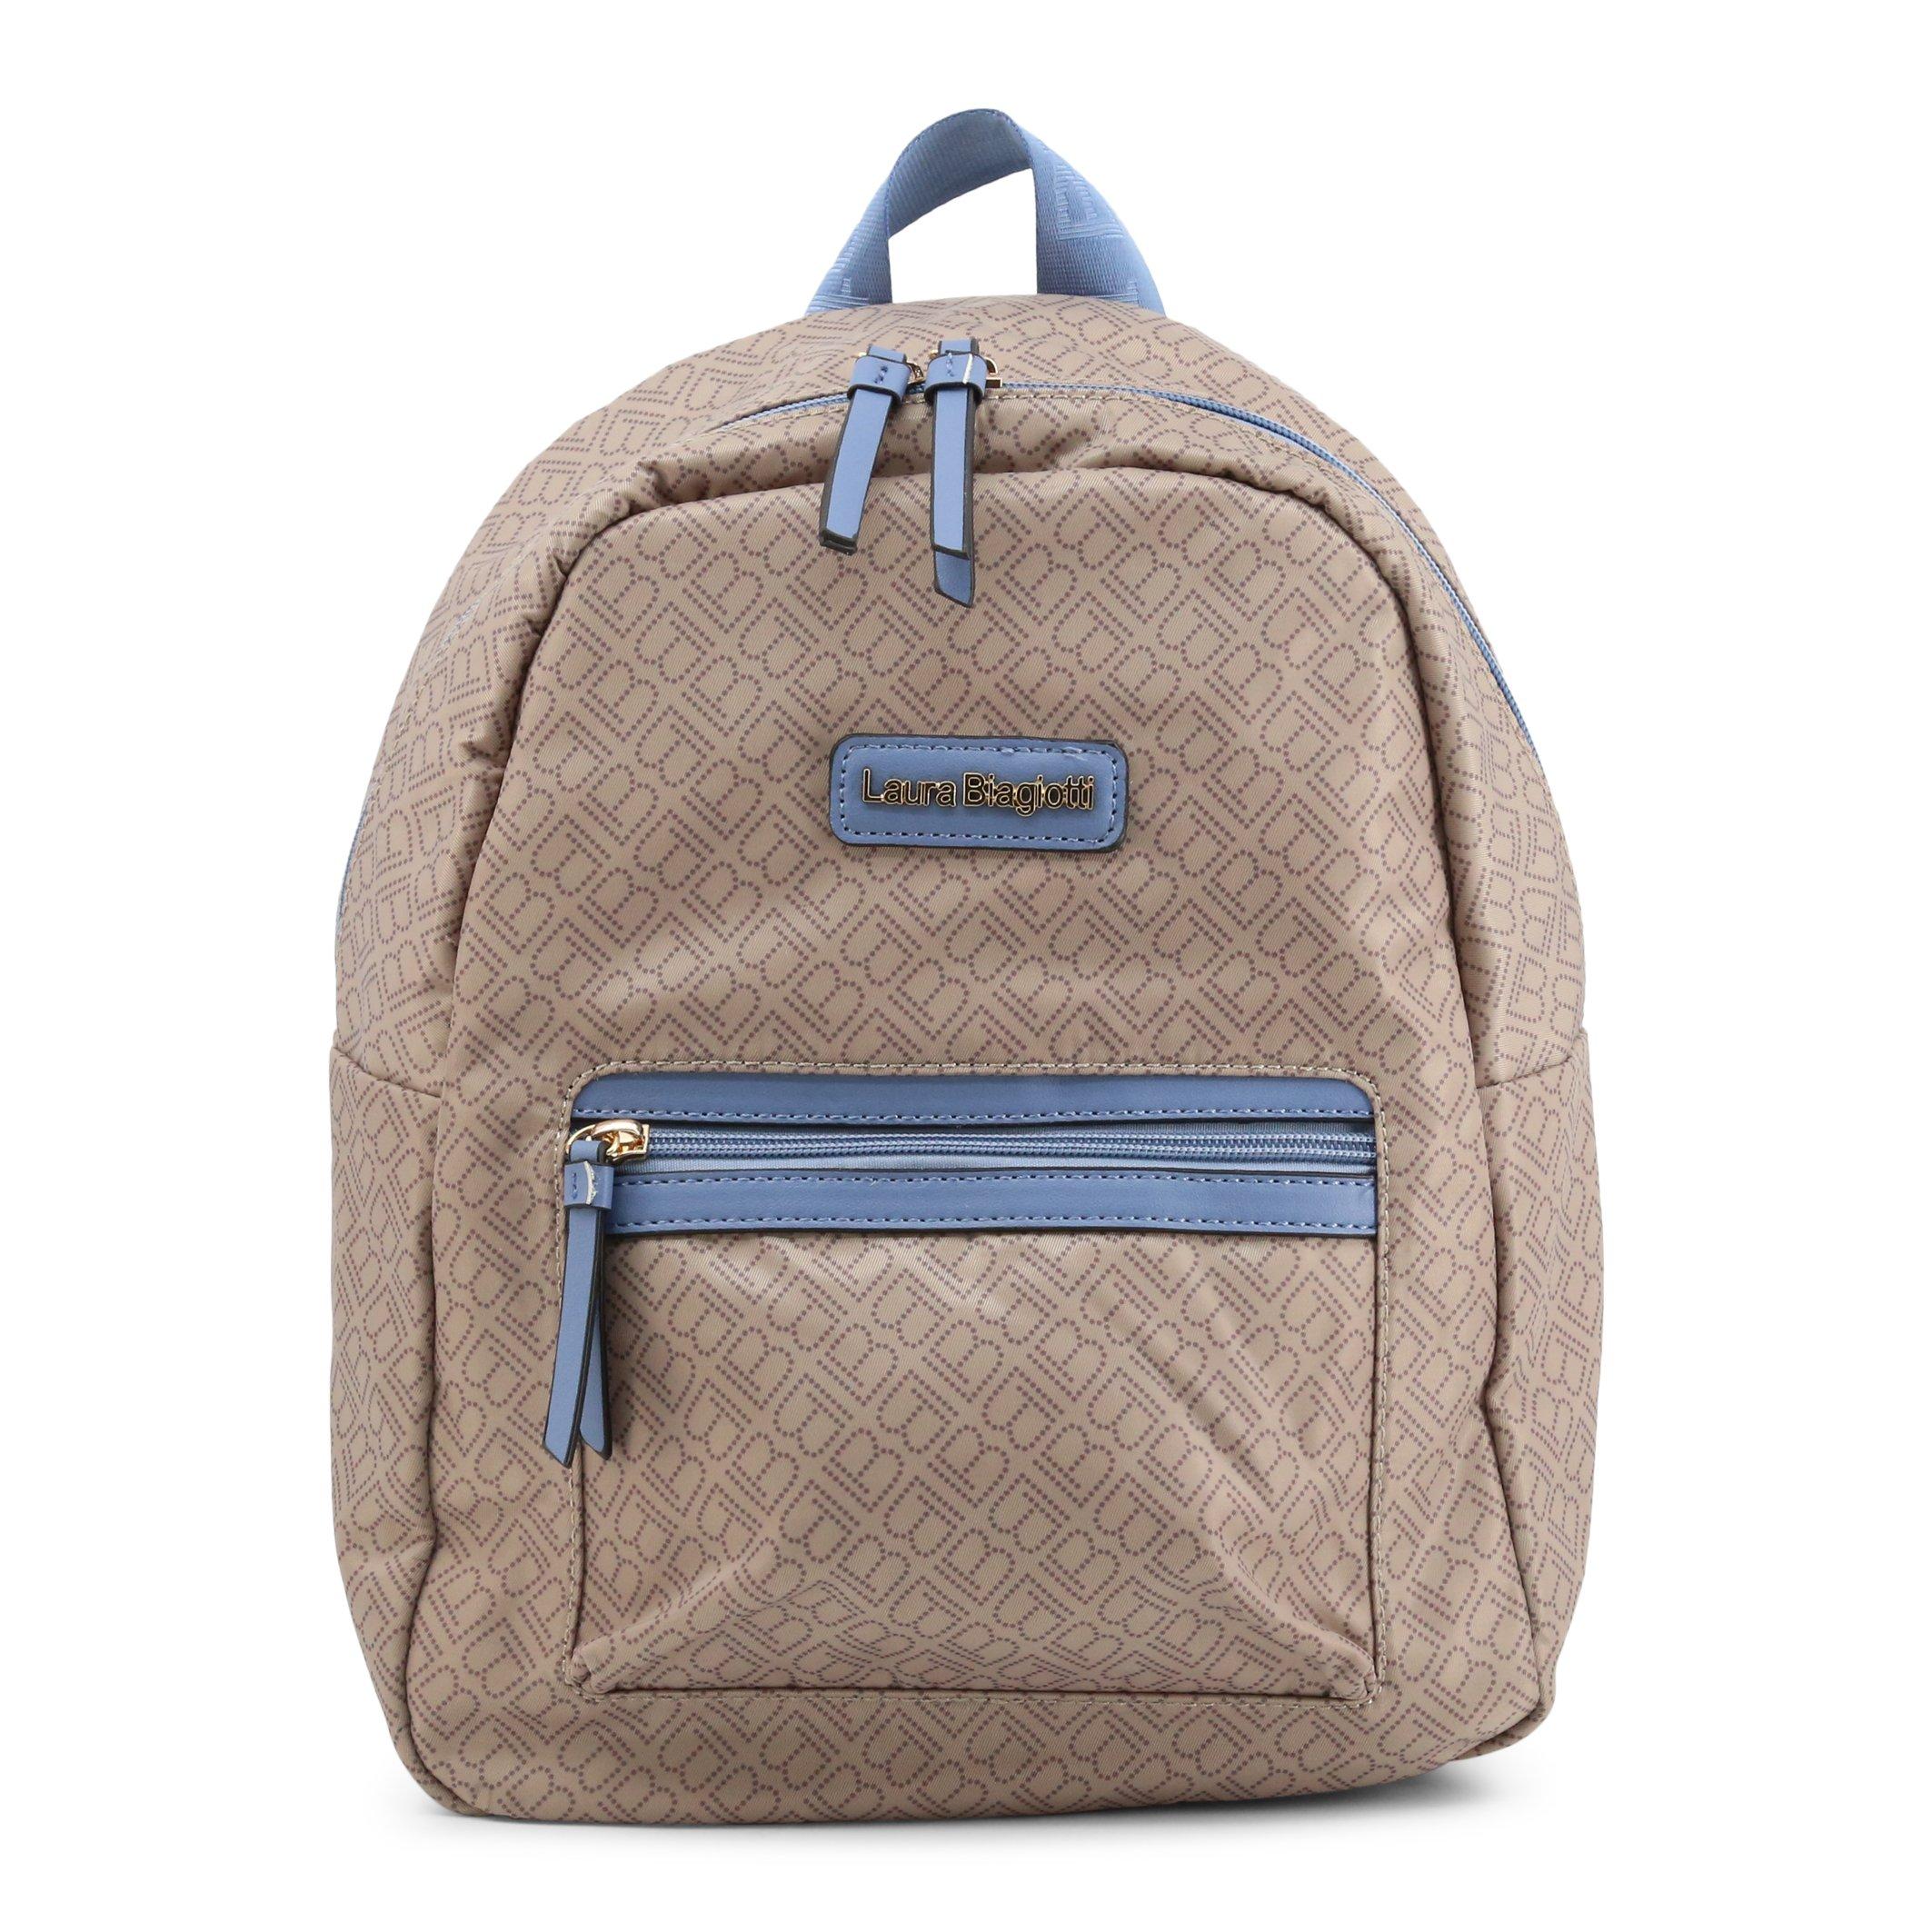 Laura Biagiotti Women's Backpack Brown Thia-105-5 - brown-2 NOSIZE